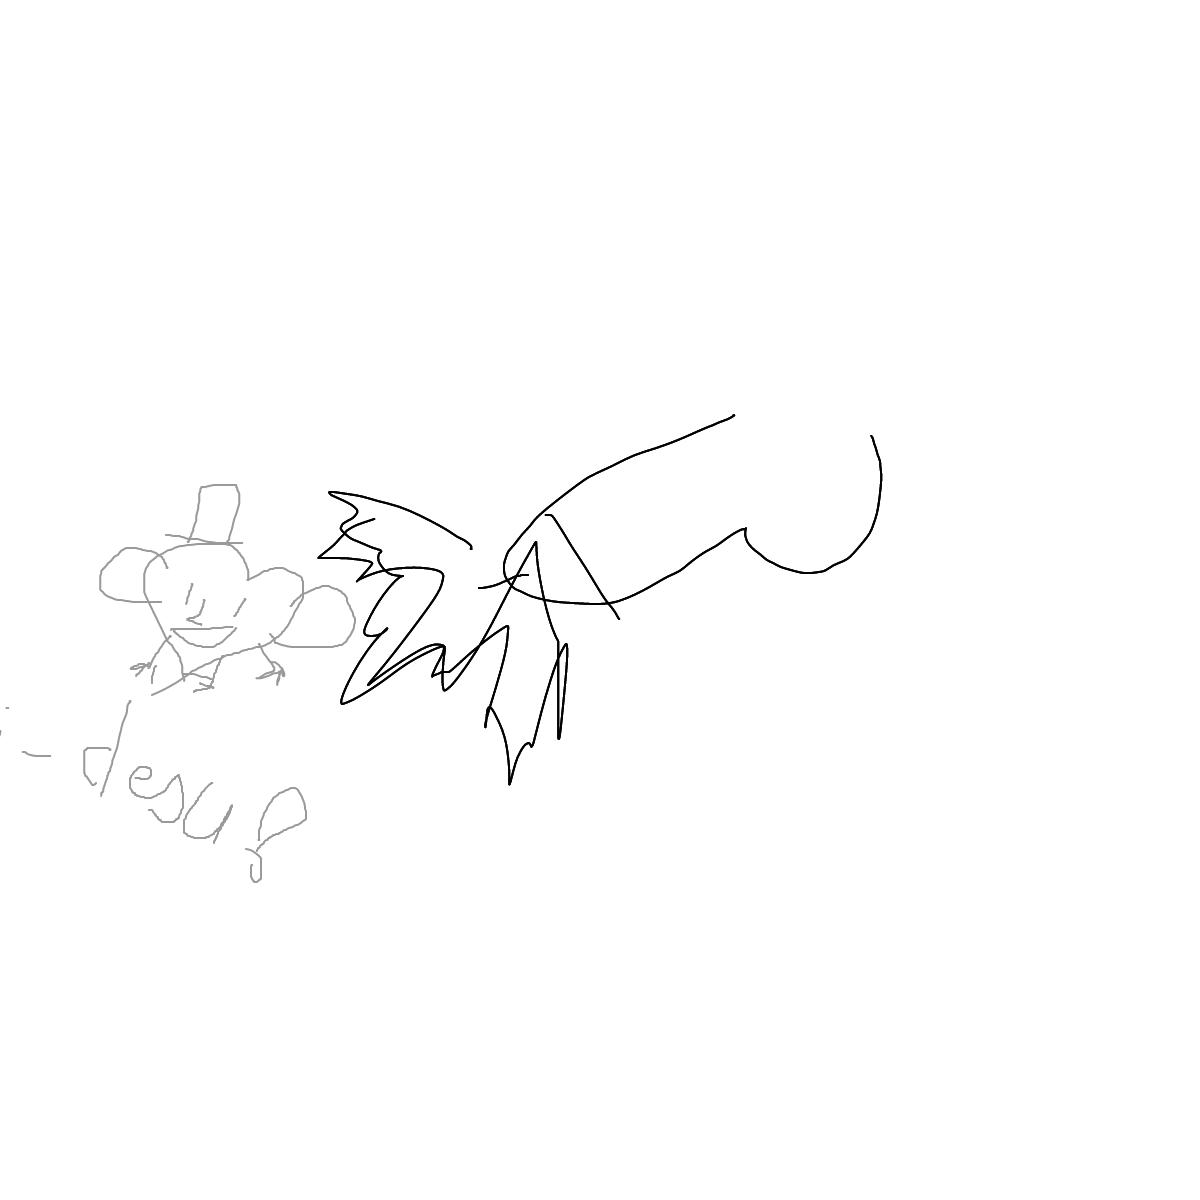 BAAAM drawing#2004 lat:35.6159172058105500lng: 139.6044769287109400